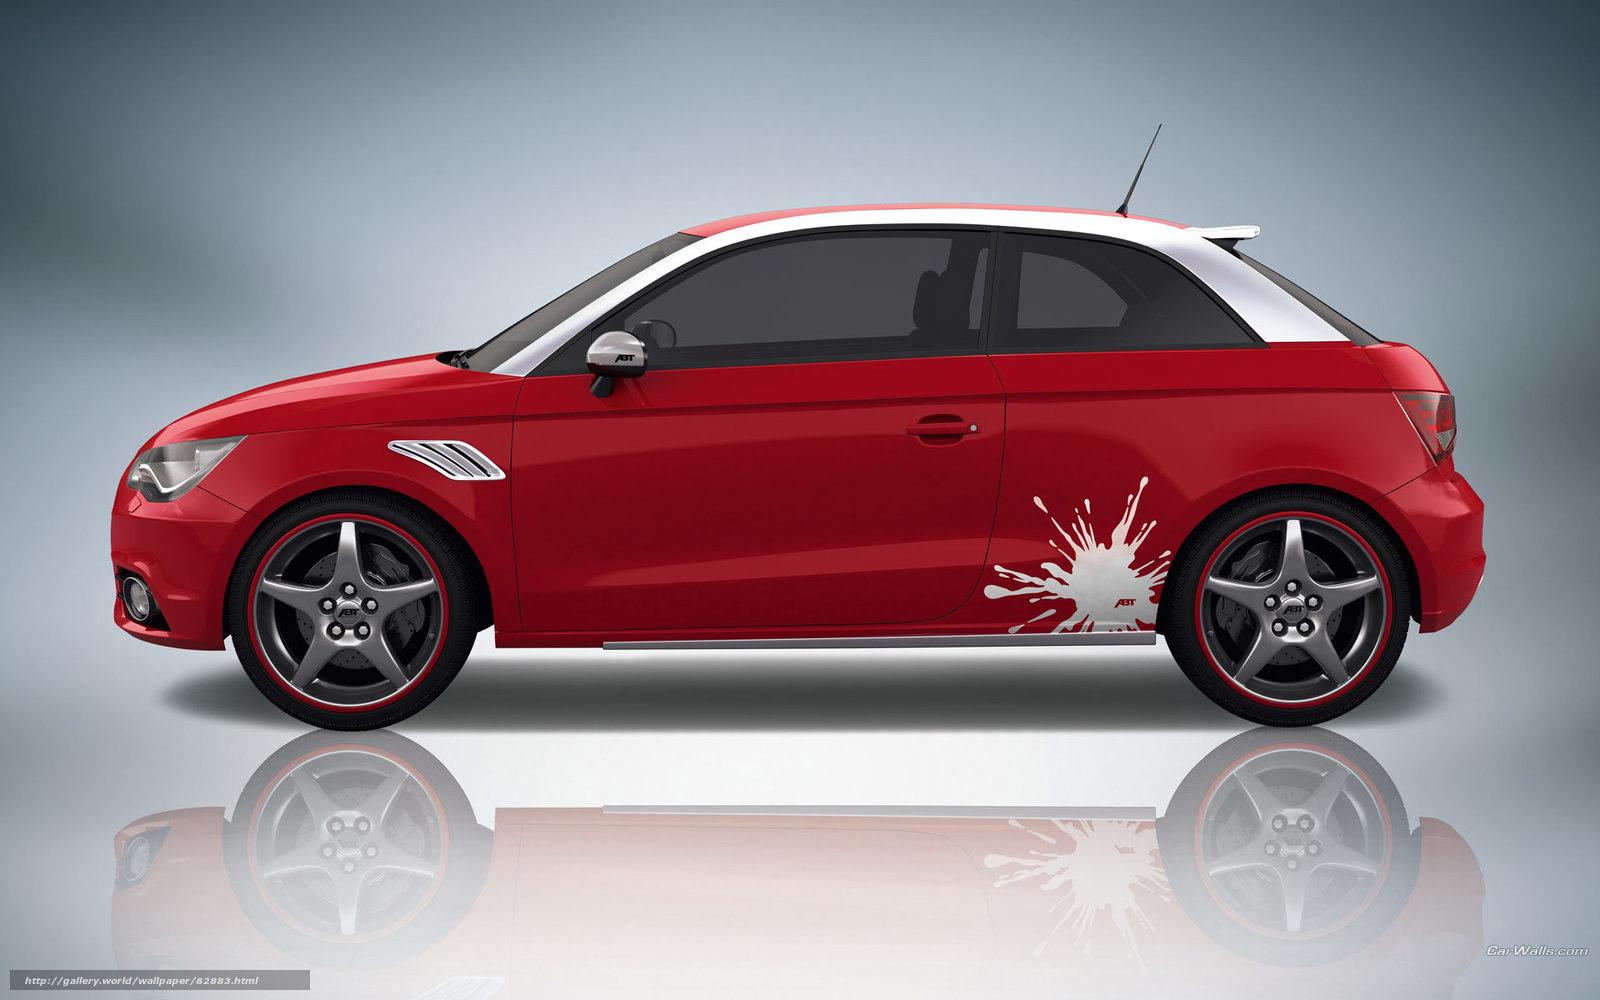 Download wallpaper Audi,  другие,  auto,  Machines free desktop wallpaper in the resolution 1920x1200 — picture №82883